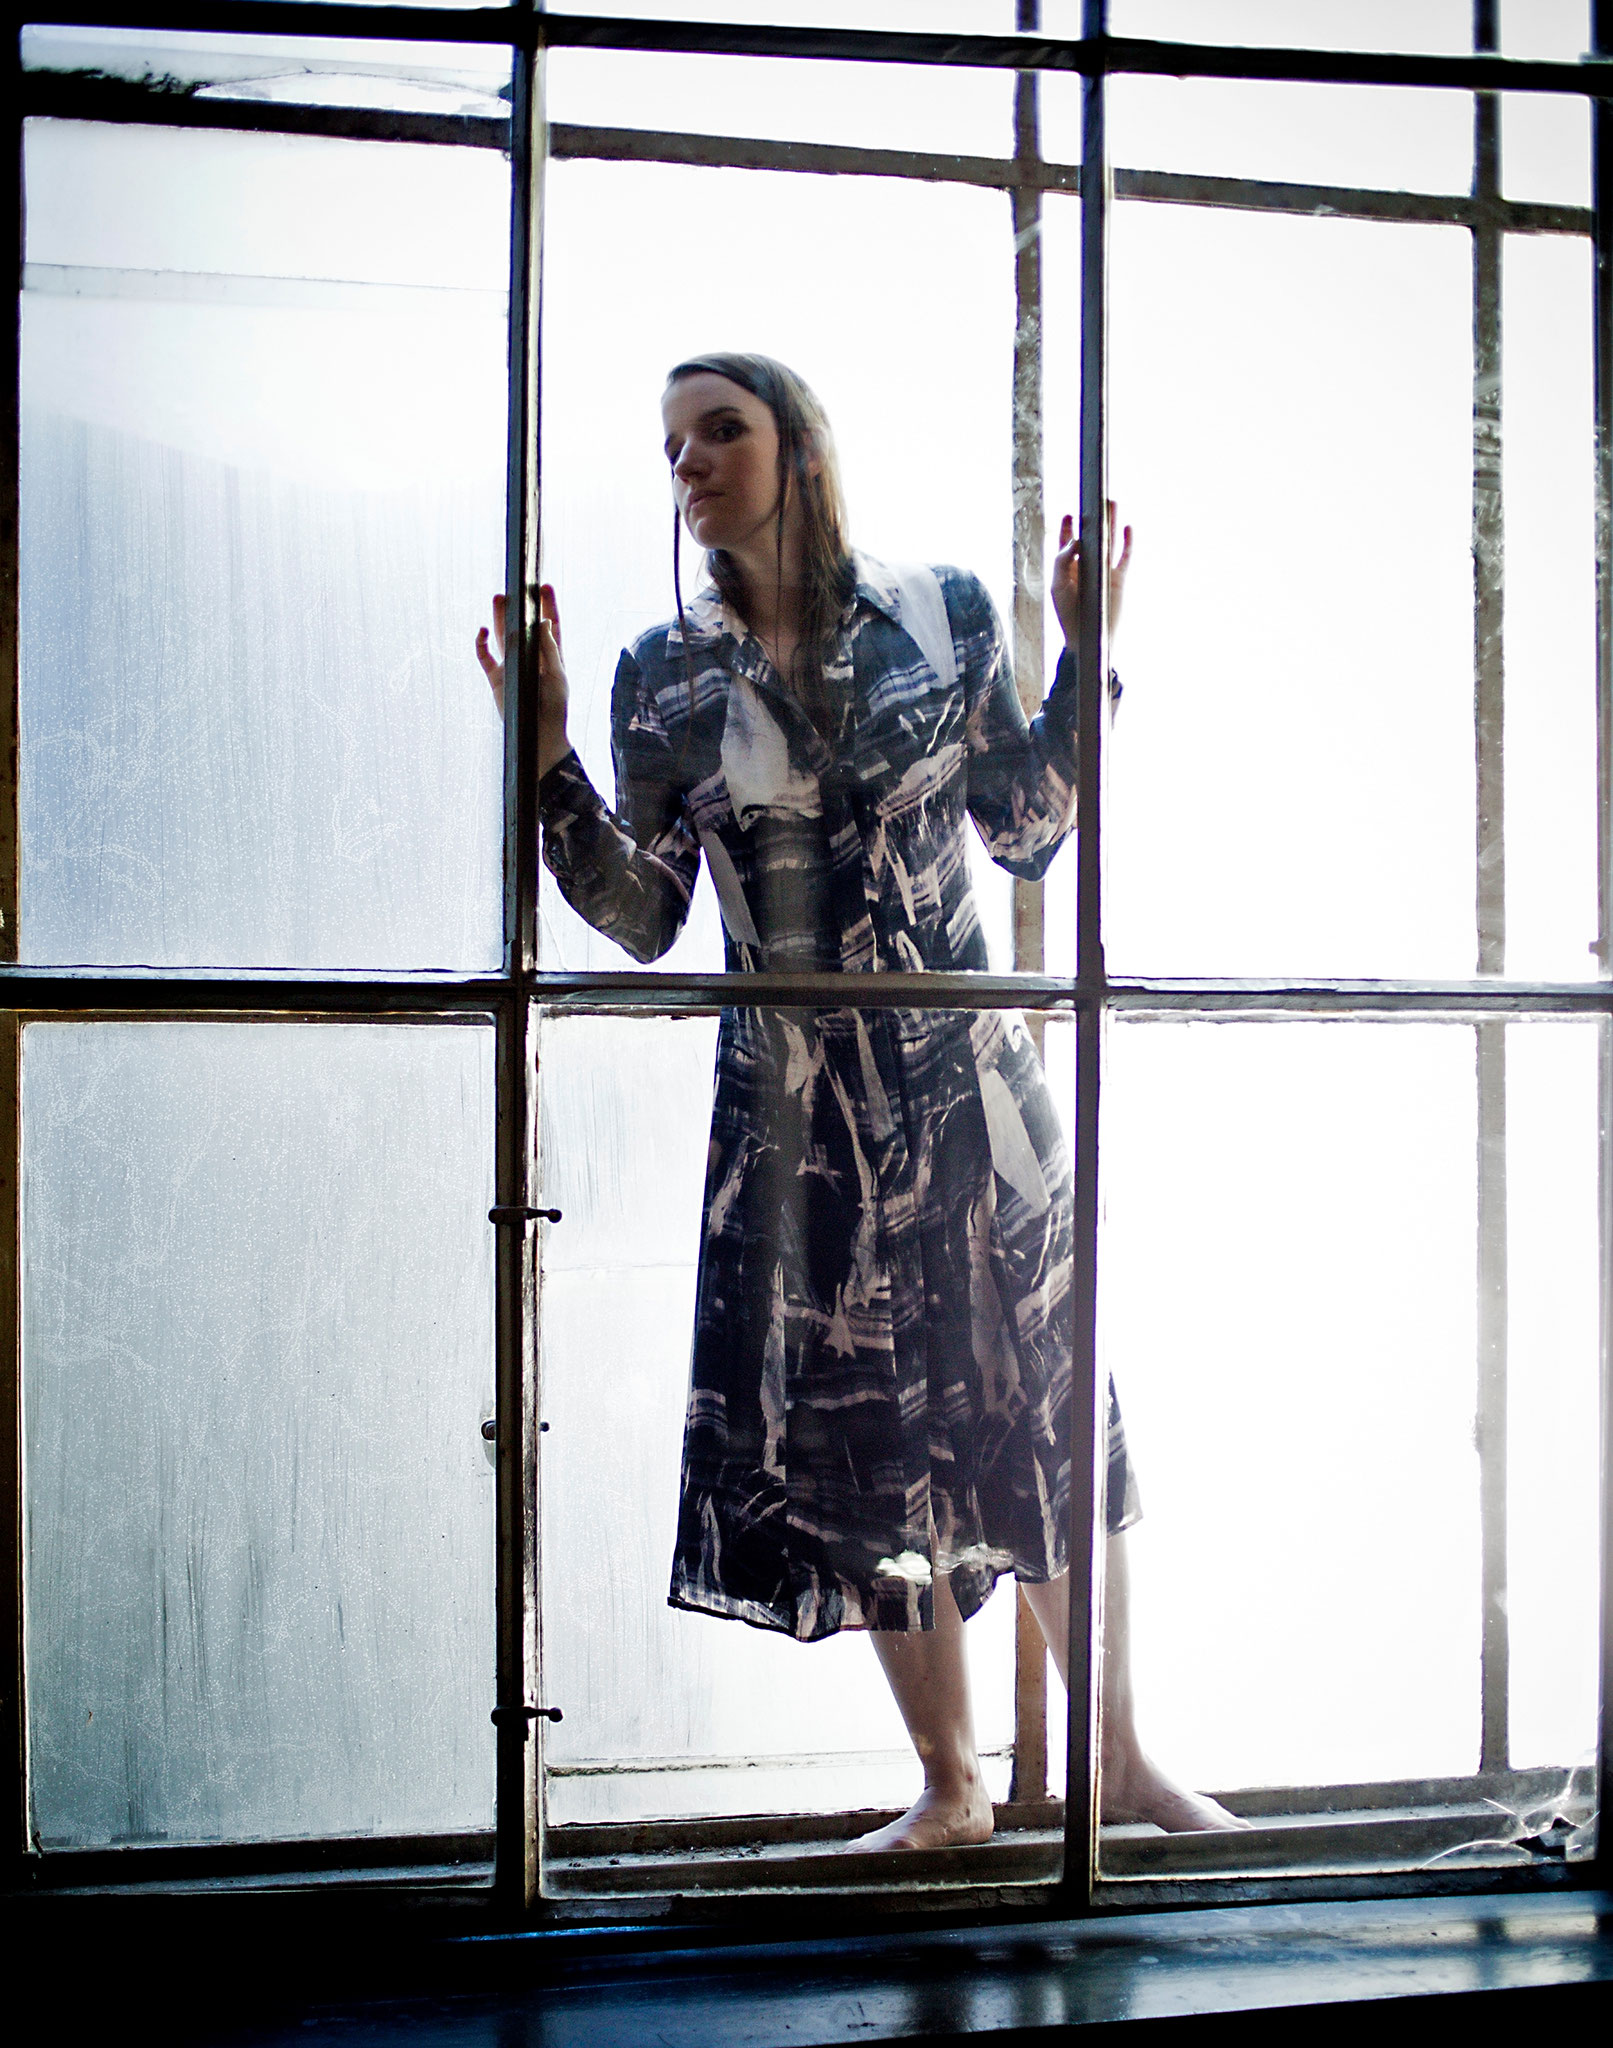 GINA LISA MAIWALD | BRUNNEN